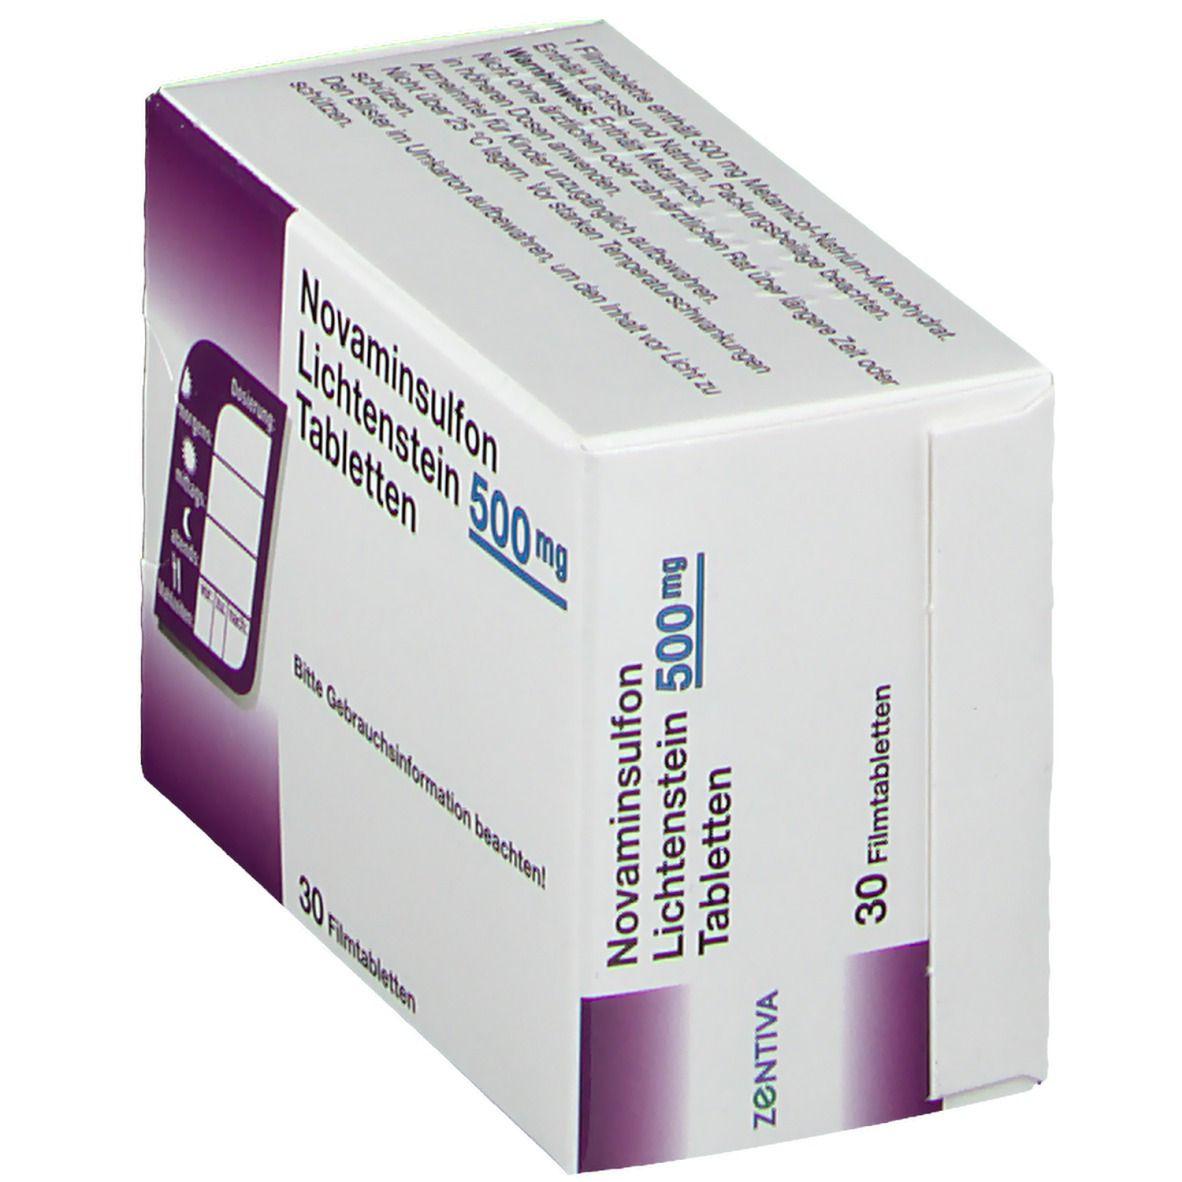 Novaminsulfon 500 mg Lichtenstein Filmtabletten 30 St